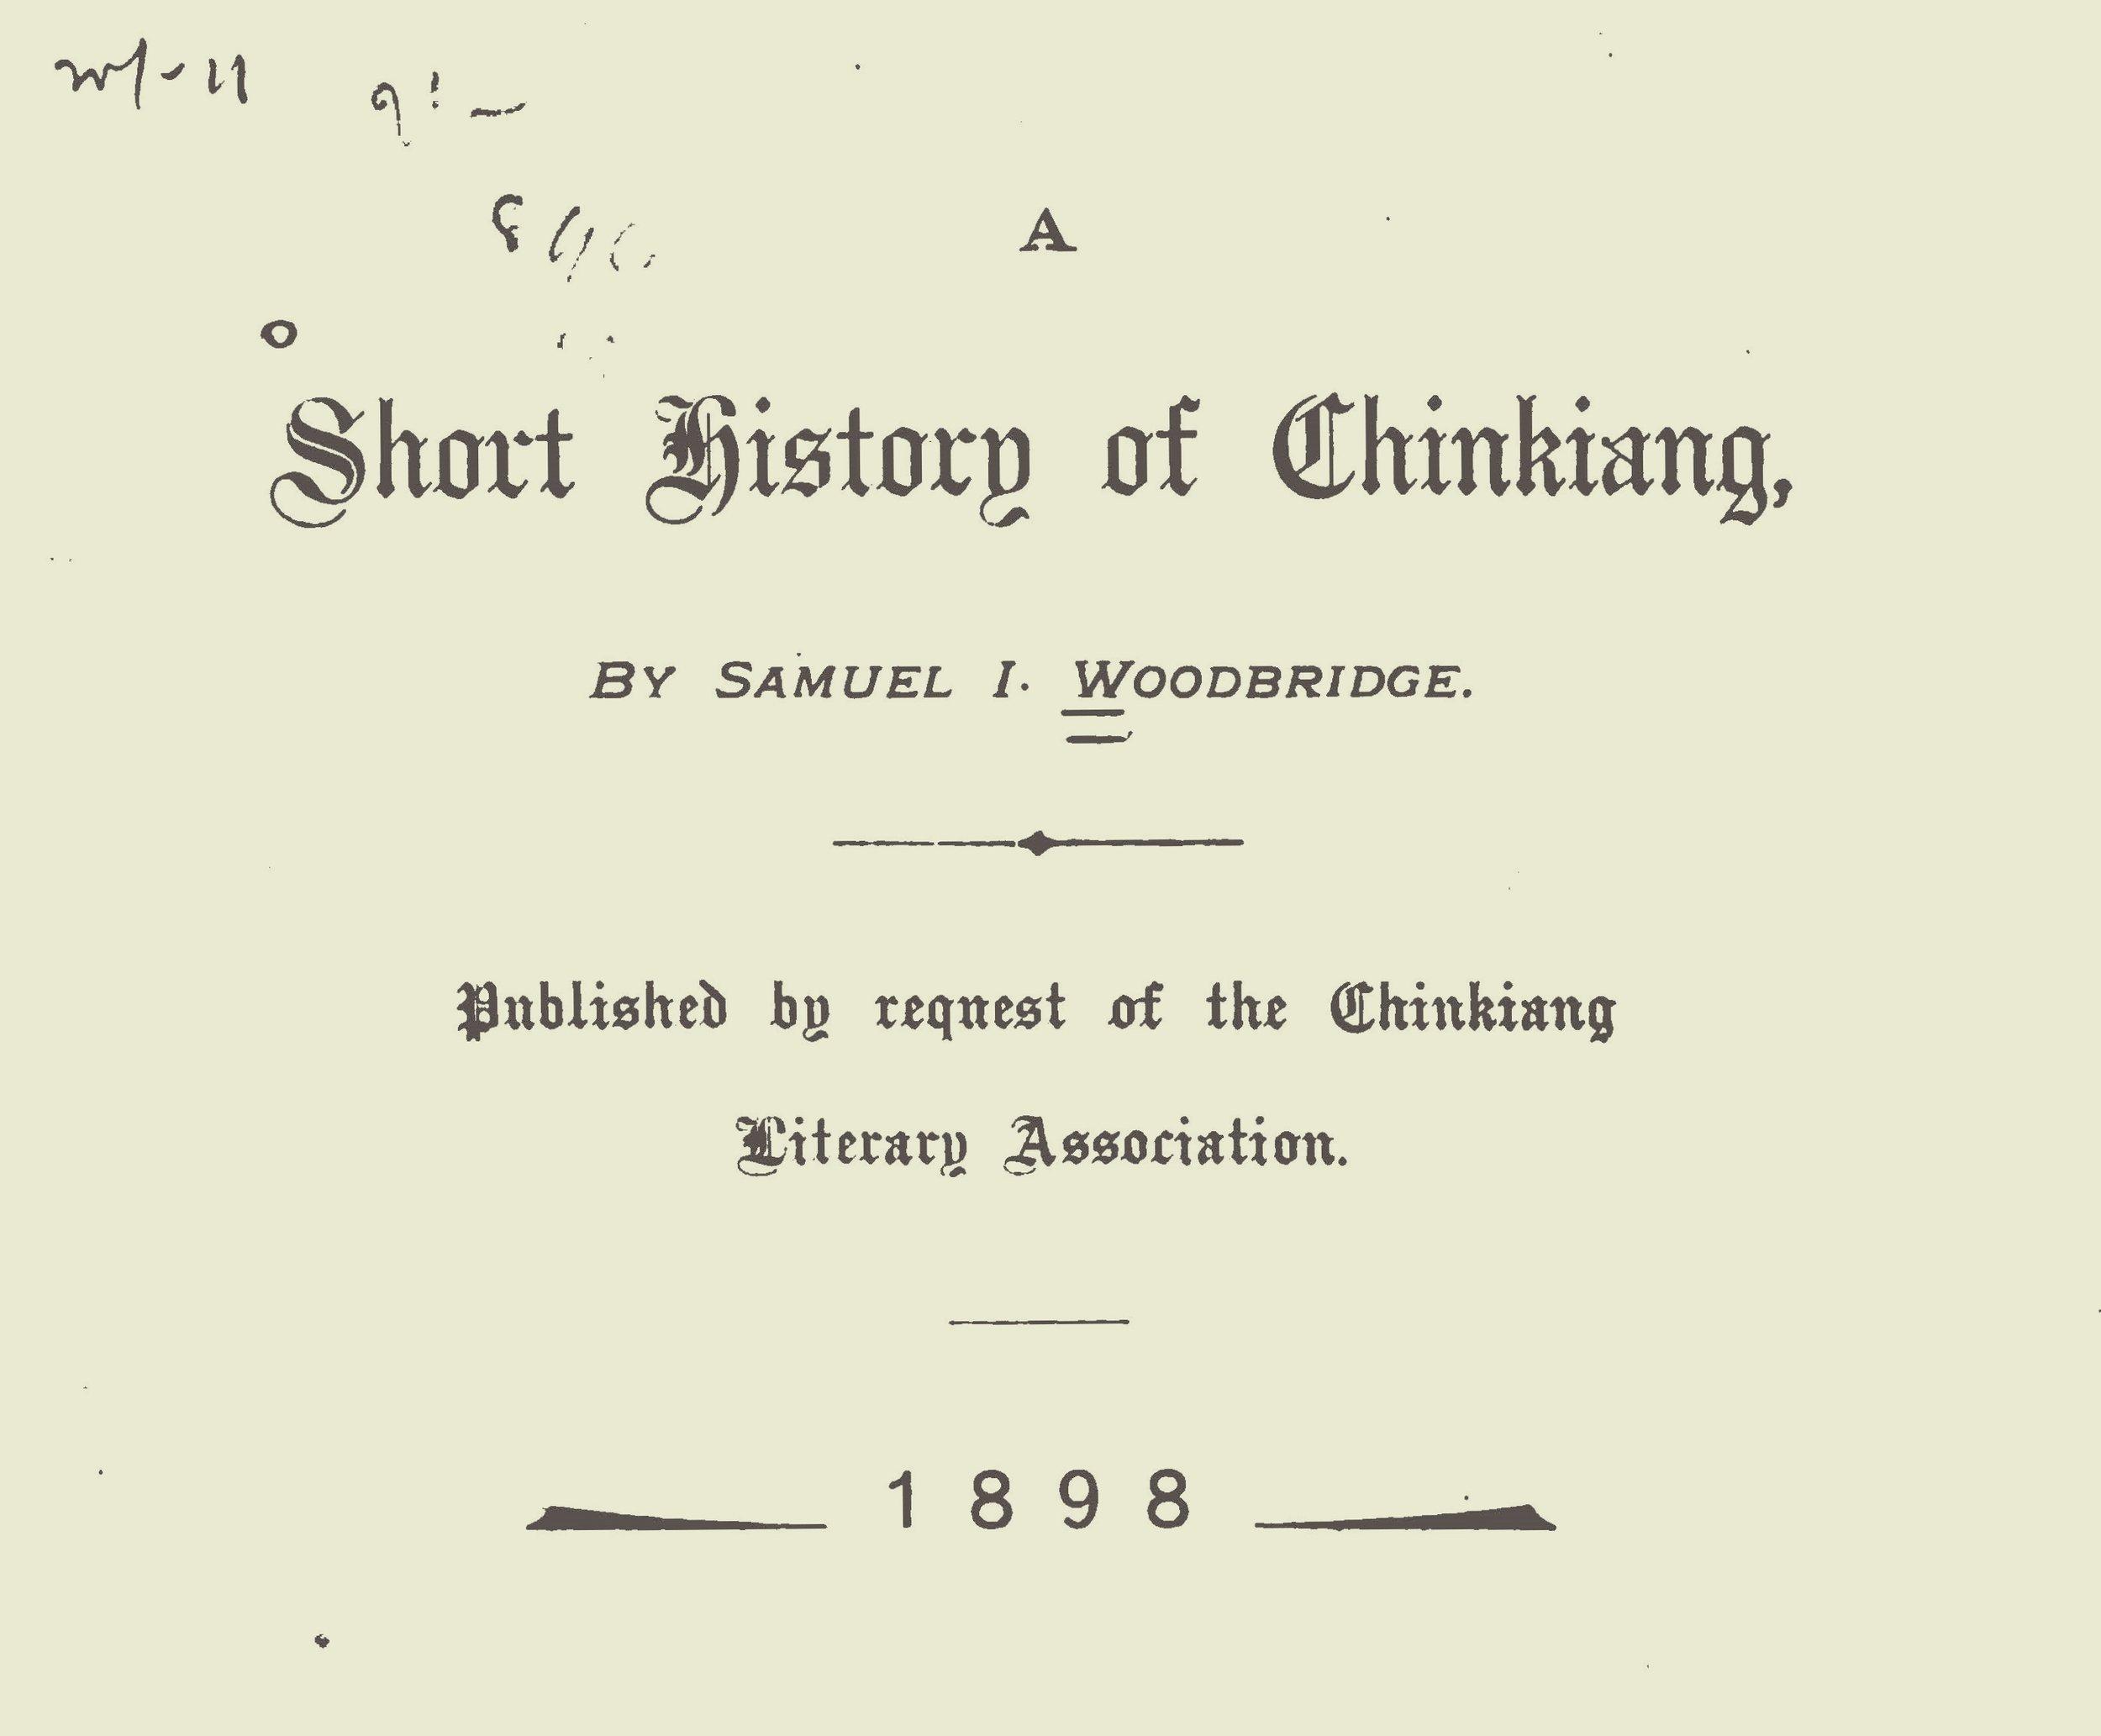 Woodbridge, Sr., Samuel Isett, A Short History of Chinkiang Title Page.jpg